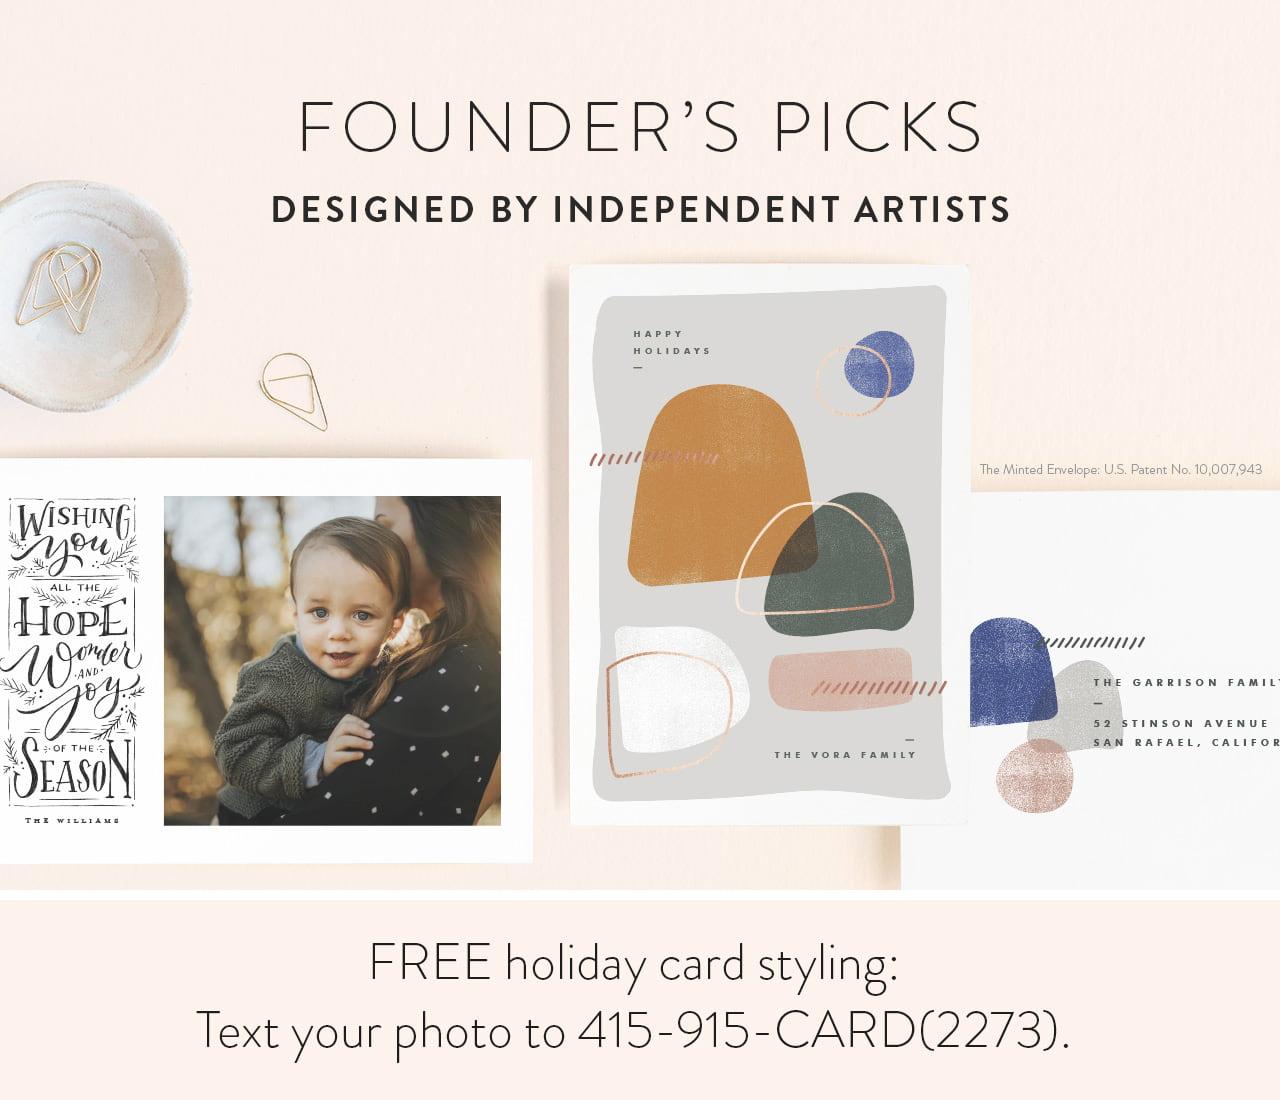 Founders Picks